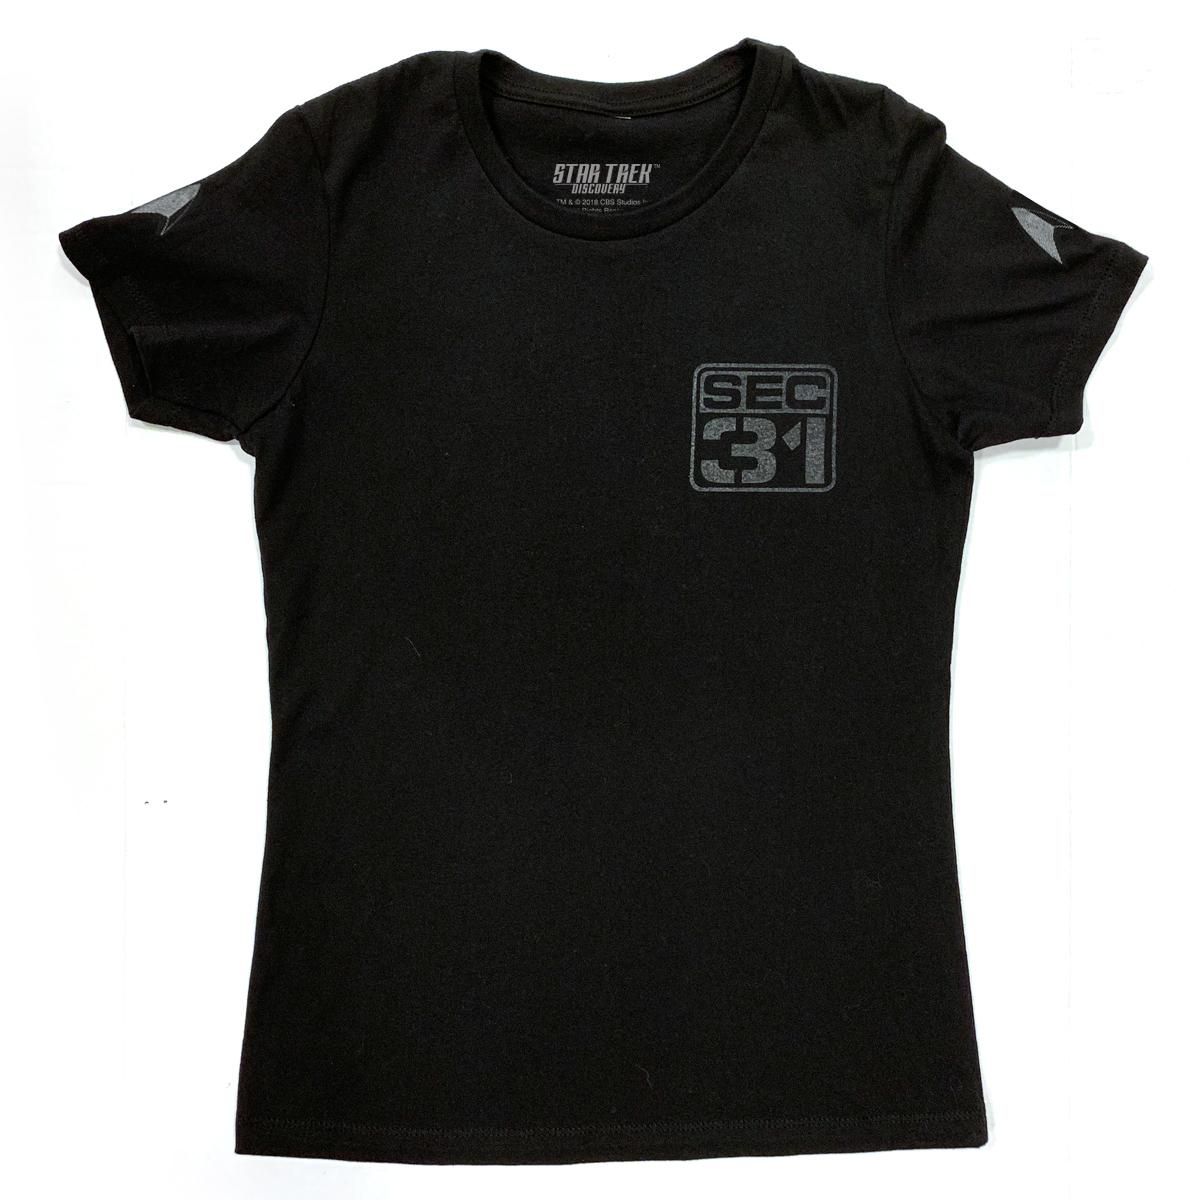 Star Trek Discovery Section 31 Women's T-Shirt